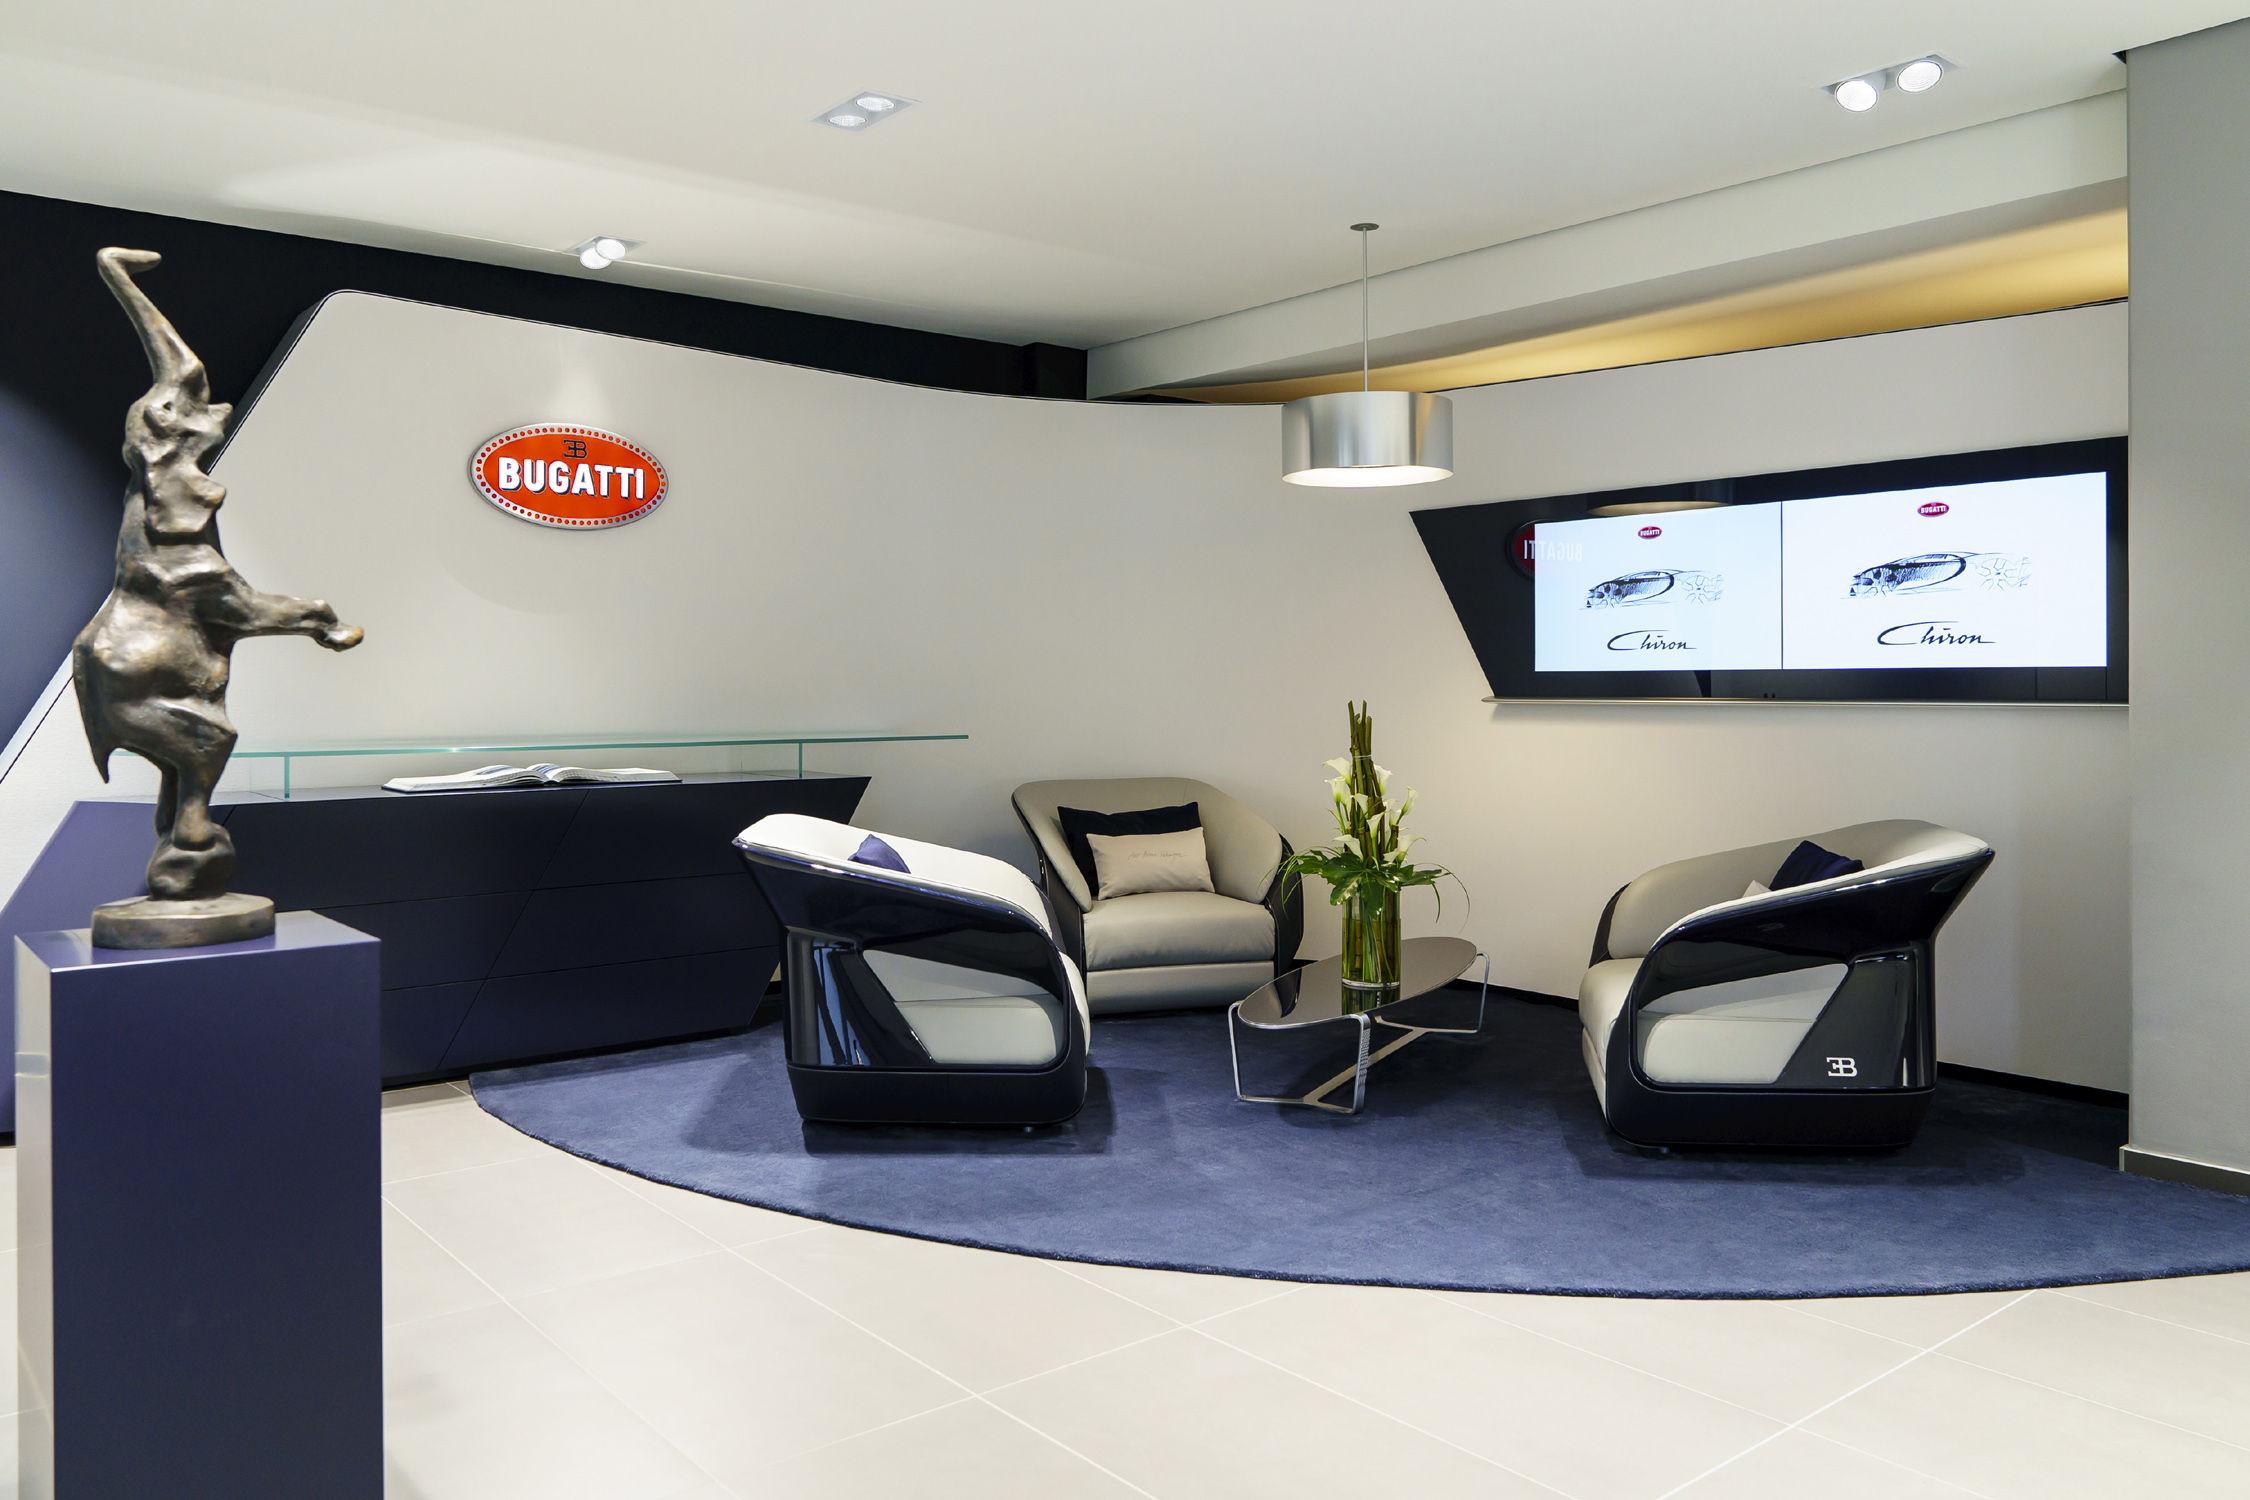 Bugatti ouvre un nouveau showroom hambourg actualit - The showroom hamburg ...